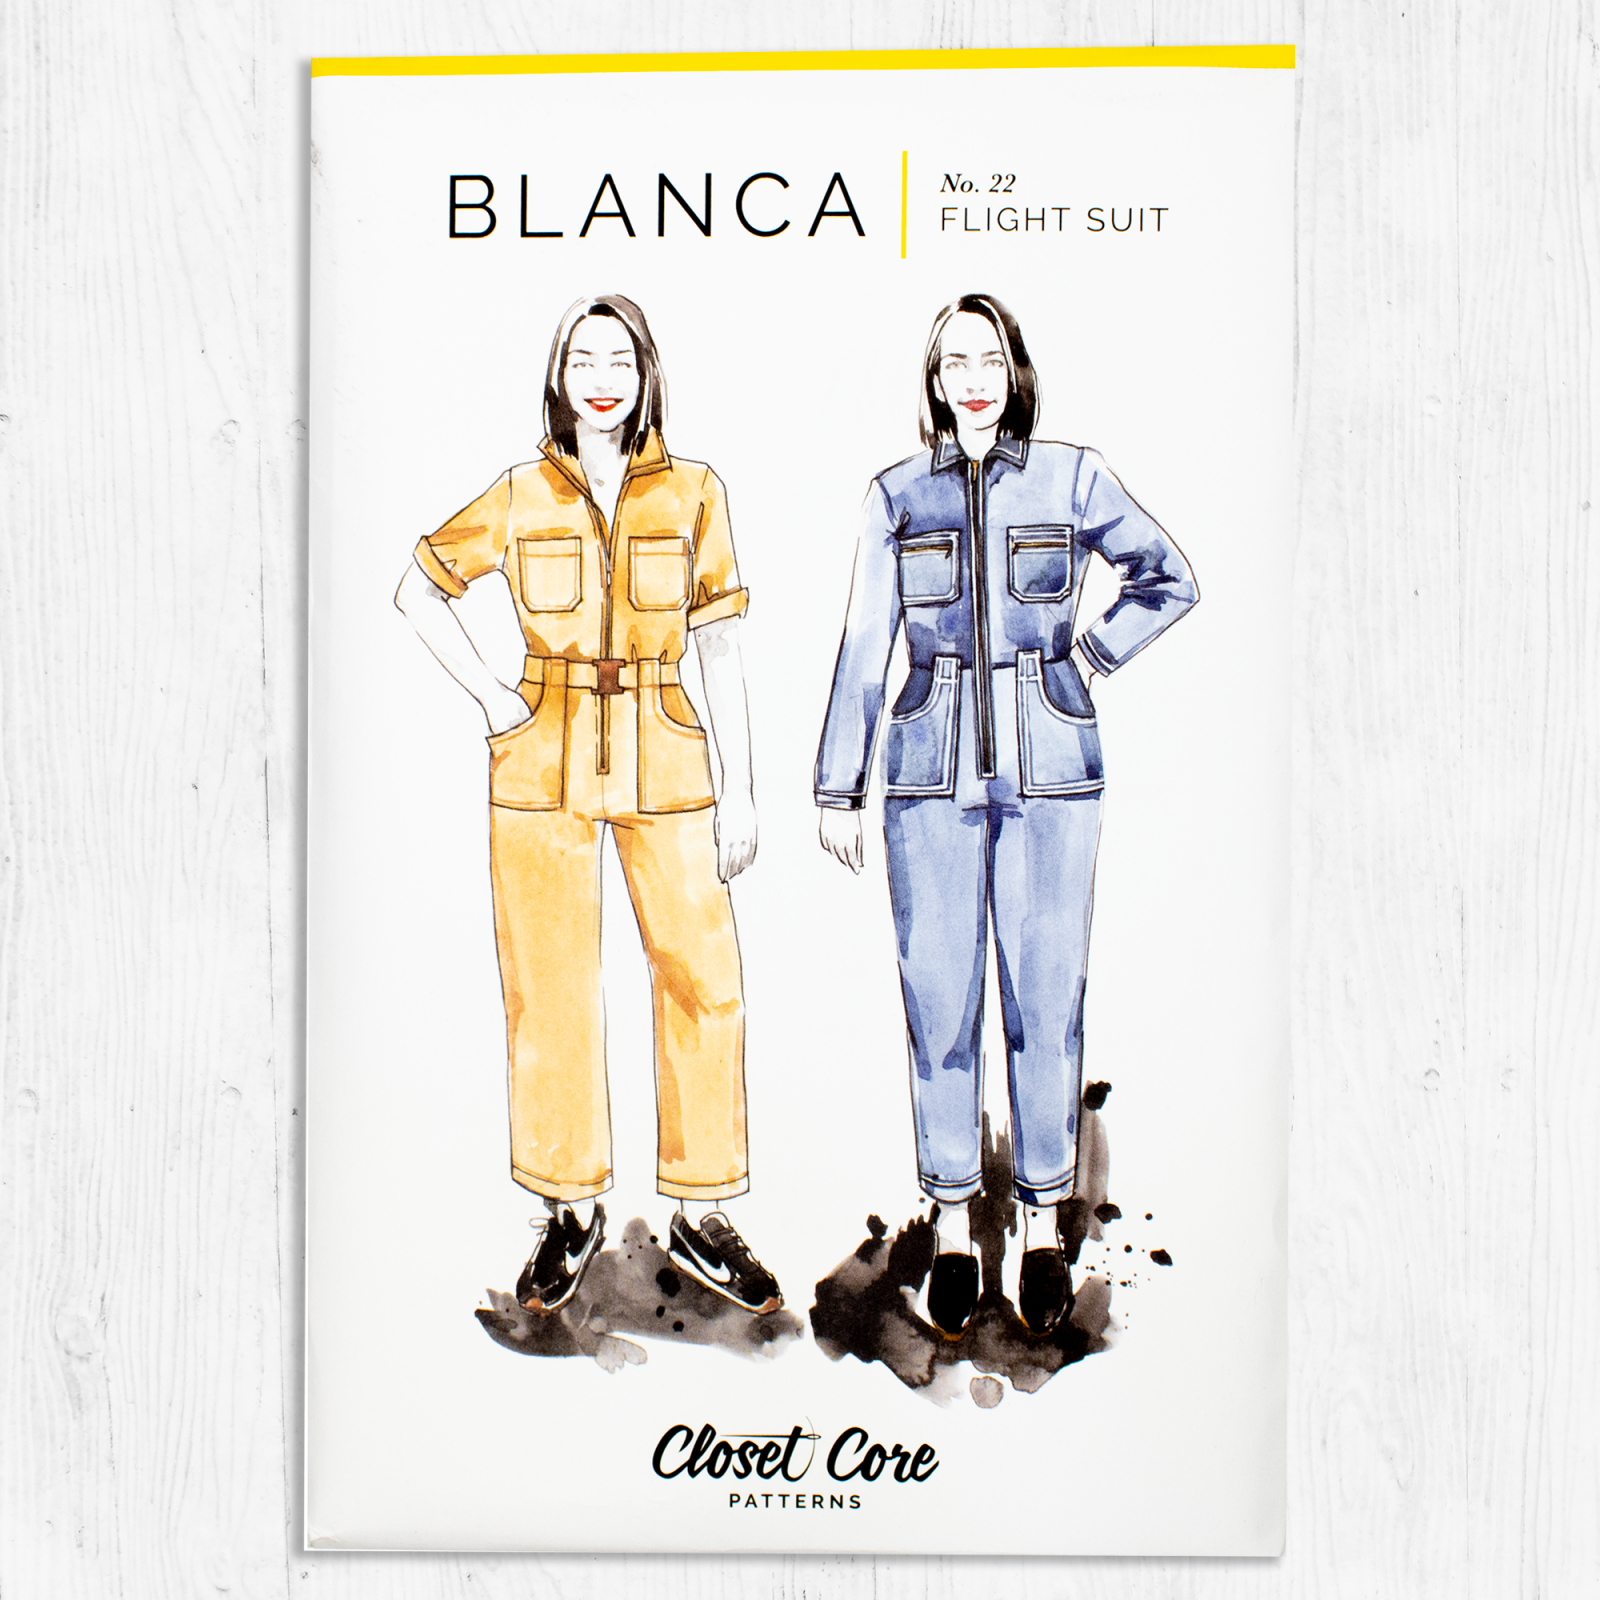 Closet Core Patterns - Blanca Flight Suit